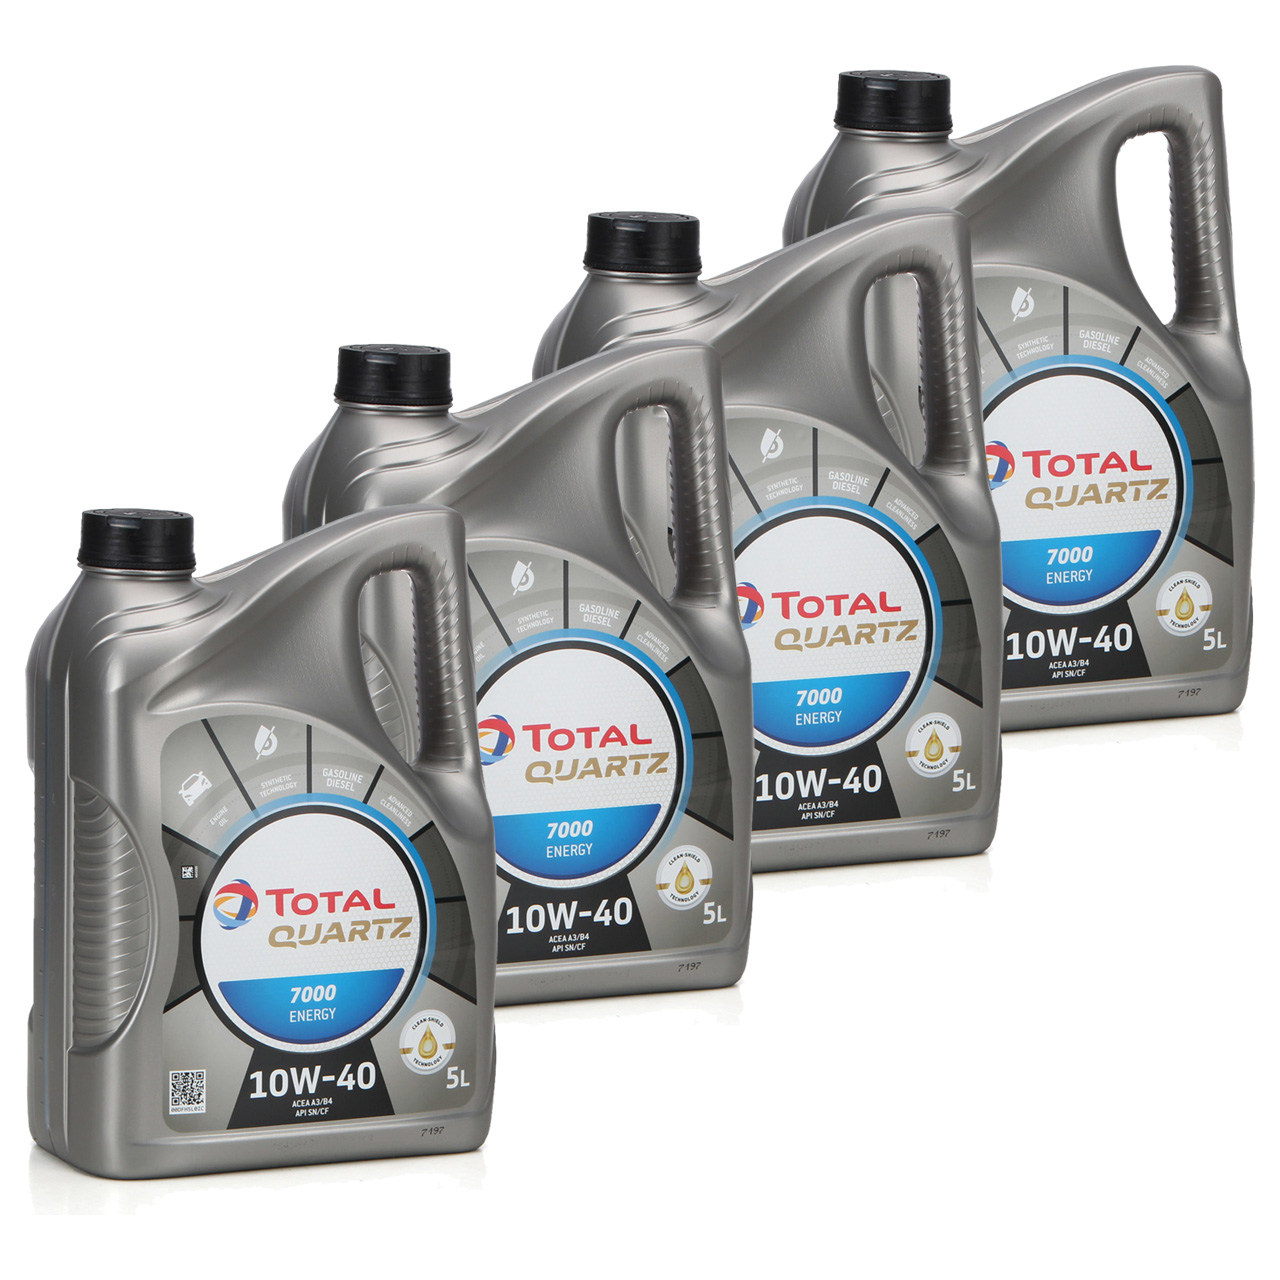 TOTAL QUARTZ 7000 ENERGY Motoröl Öl 10W-40 10W40 VW 501.01/505.00 - 20L 20 Liter